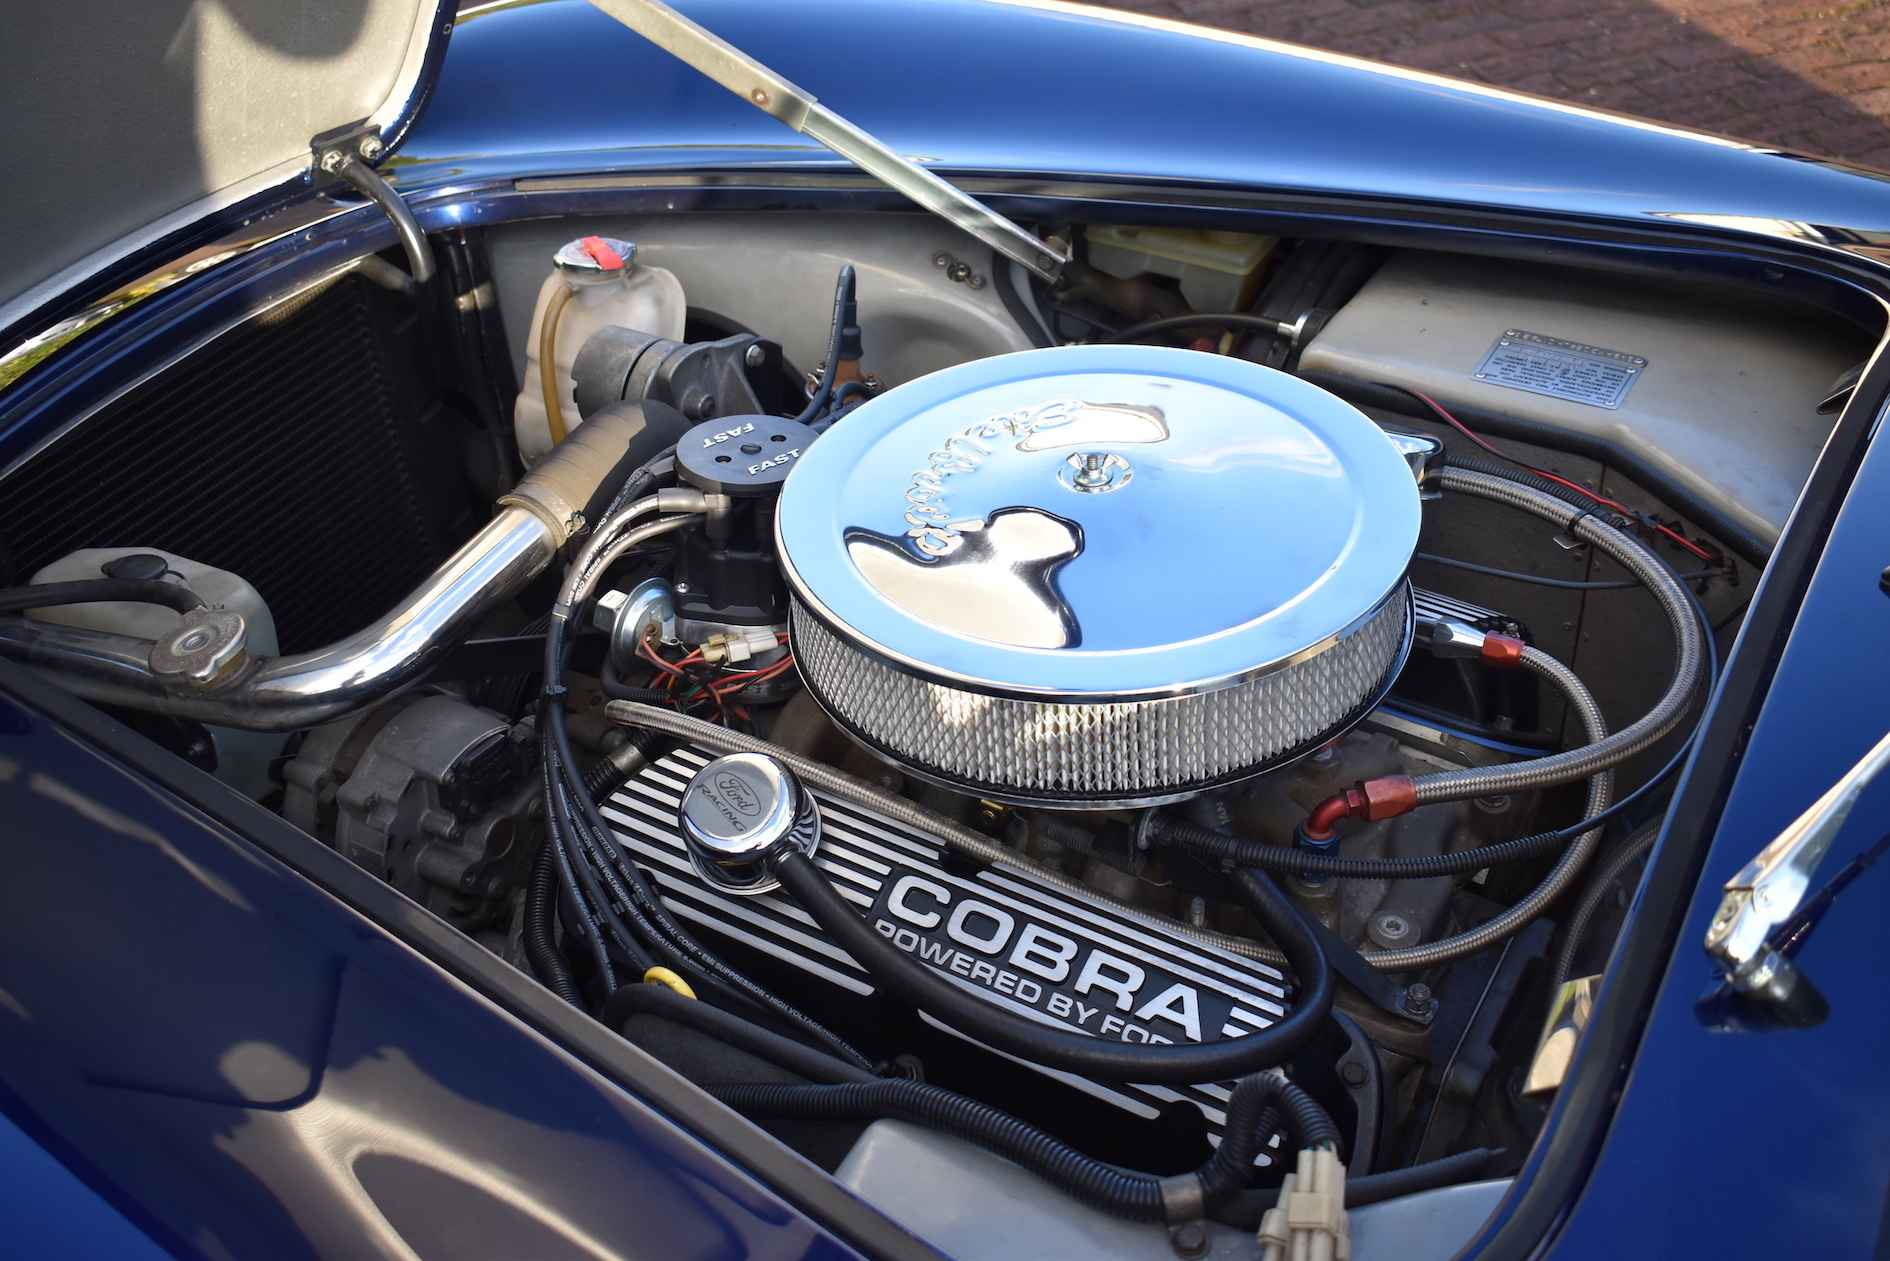 ac-cobra-lightweight-for-sale